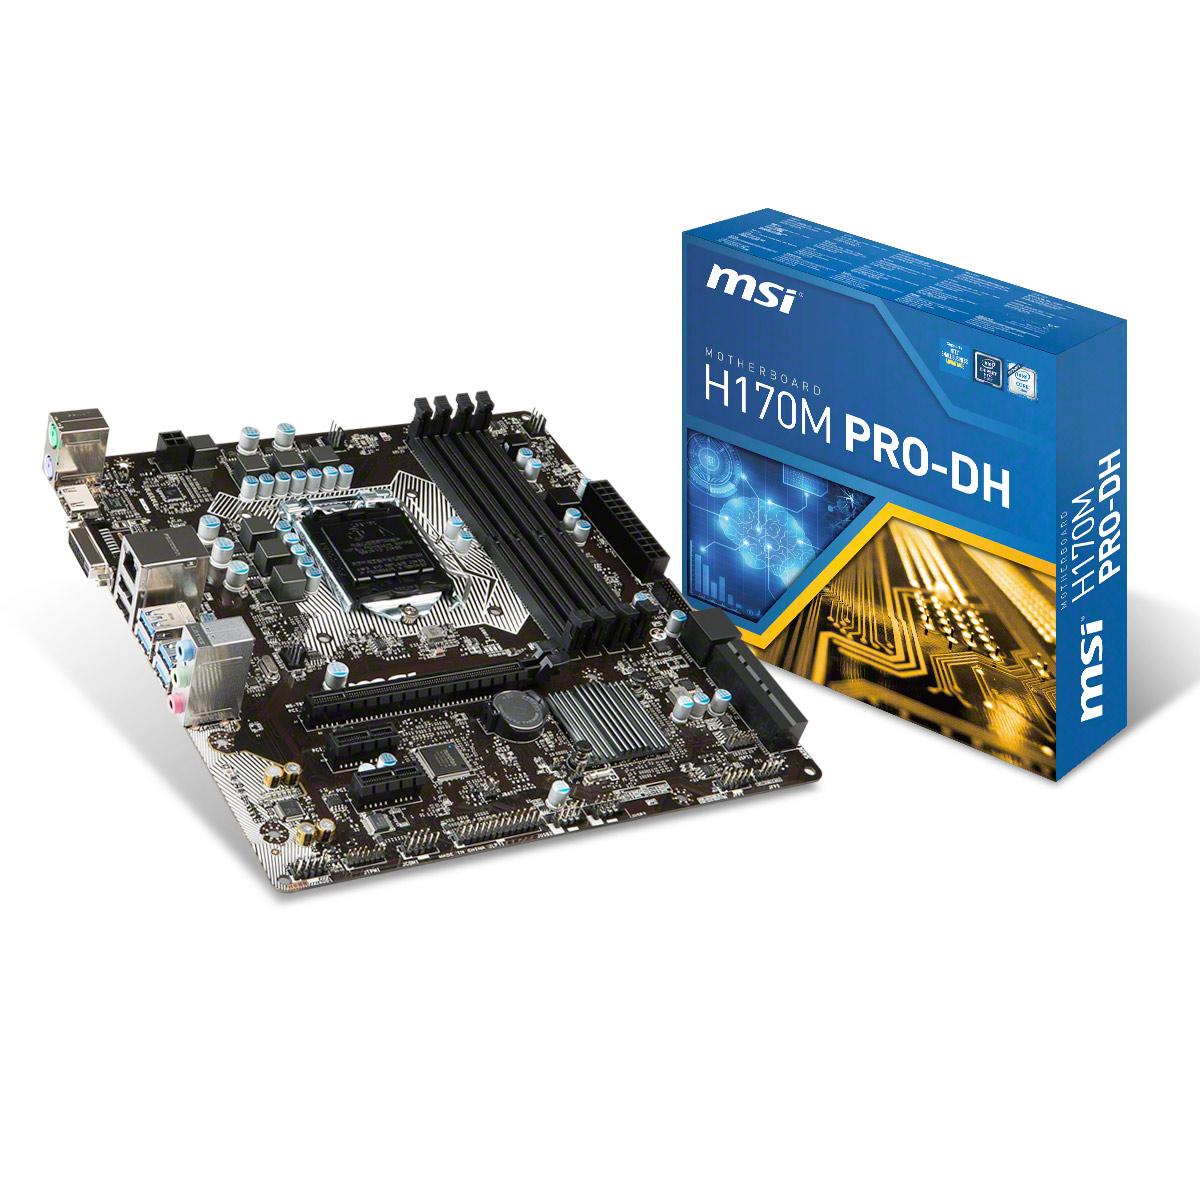 Mainboard MSI H170M PRO-DH Socket 1151 (H170M PRO-DH)